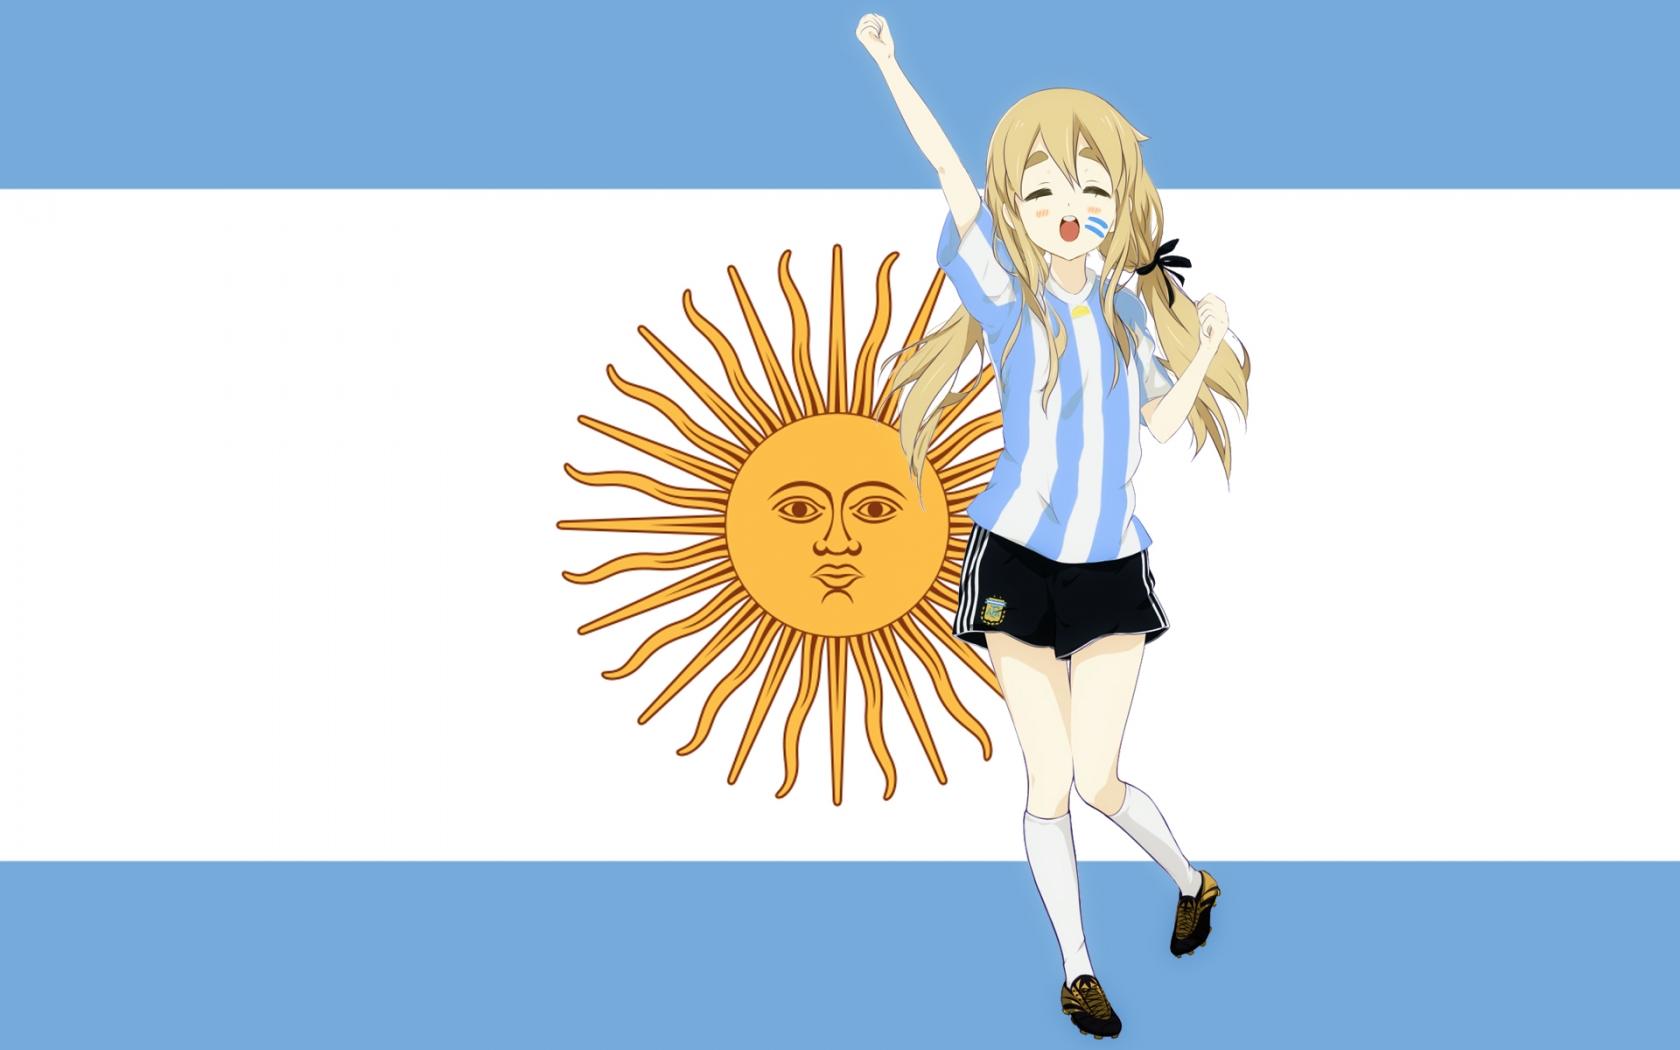 Chica K-ON de Argentina - 1680x1050